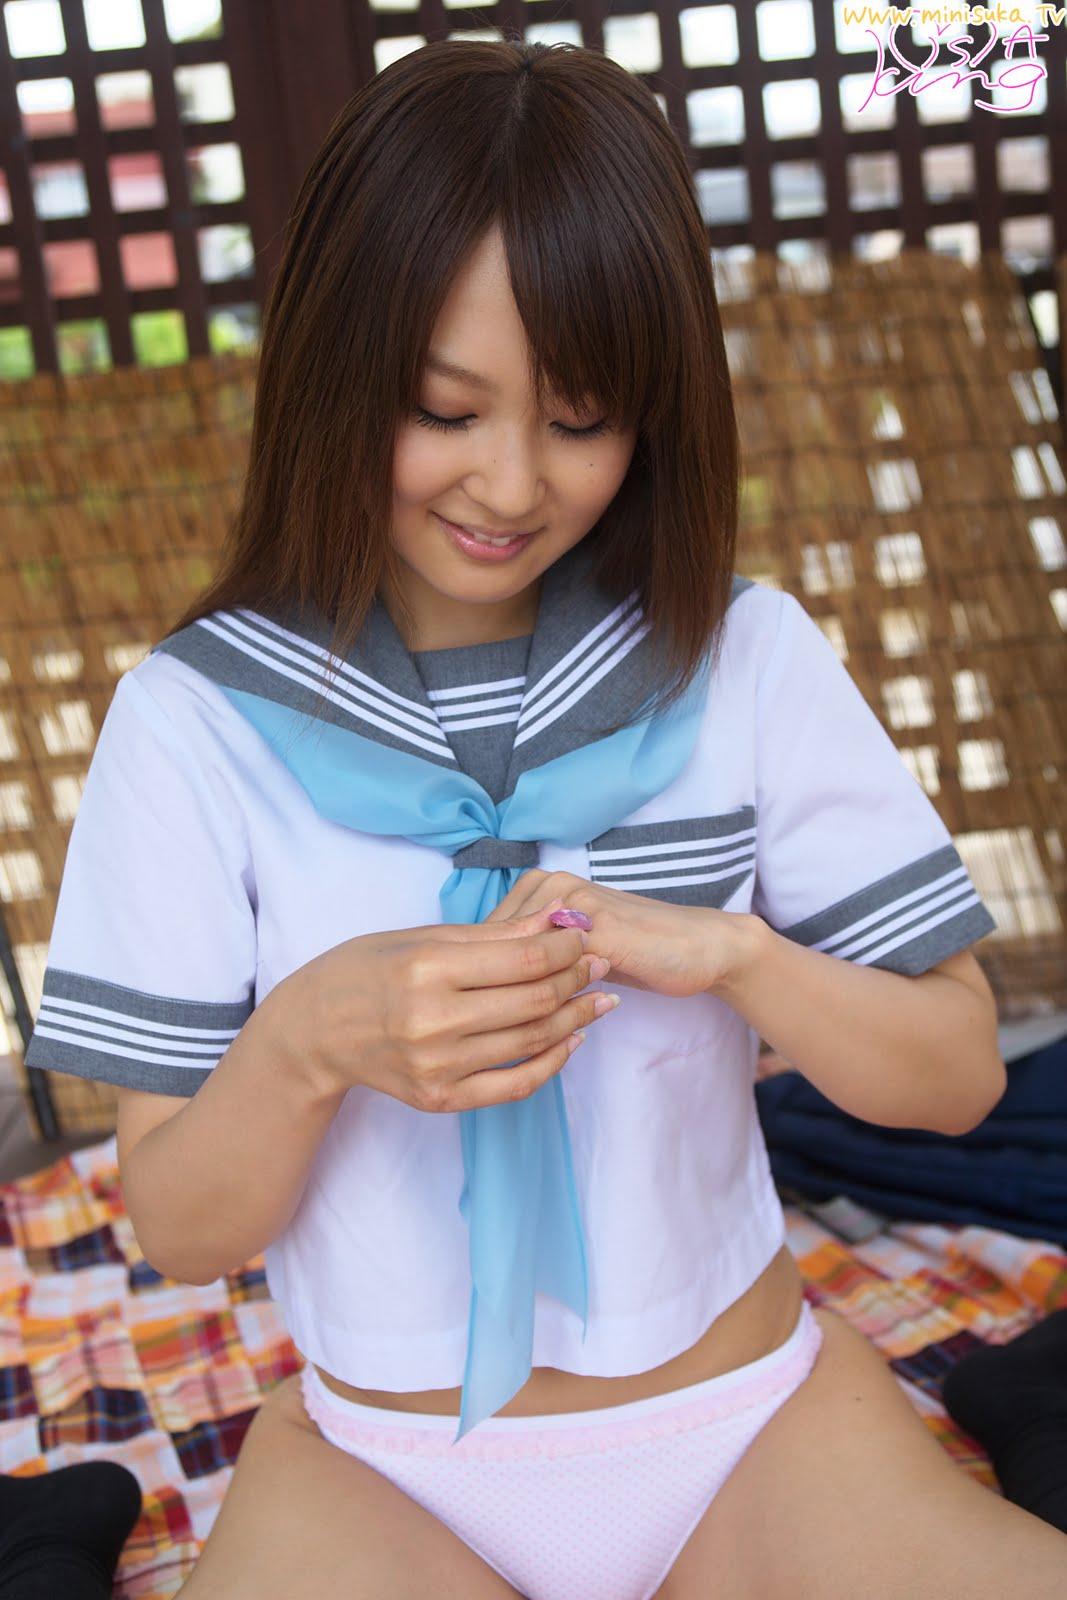 Eri minami 05 japanese beauties - 3 part 1